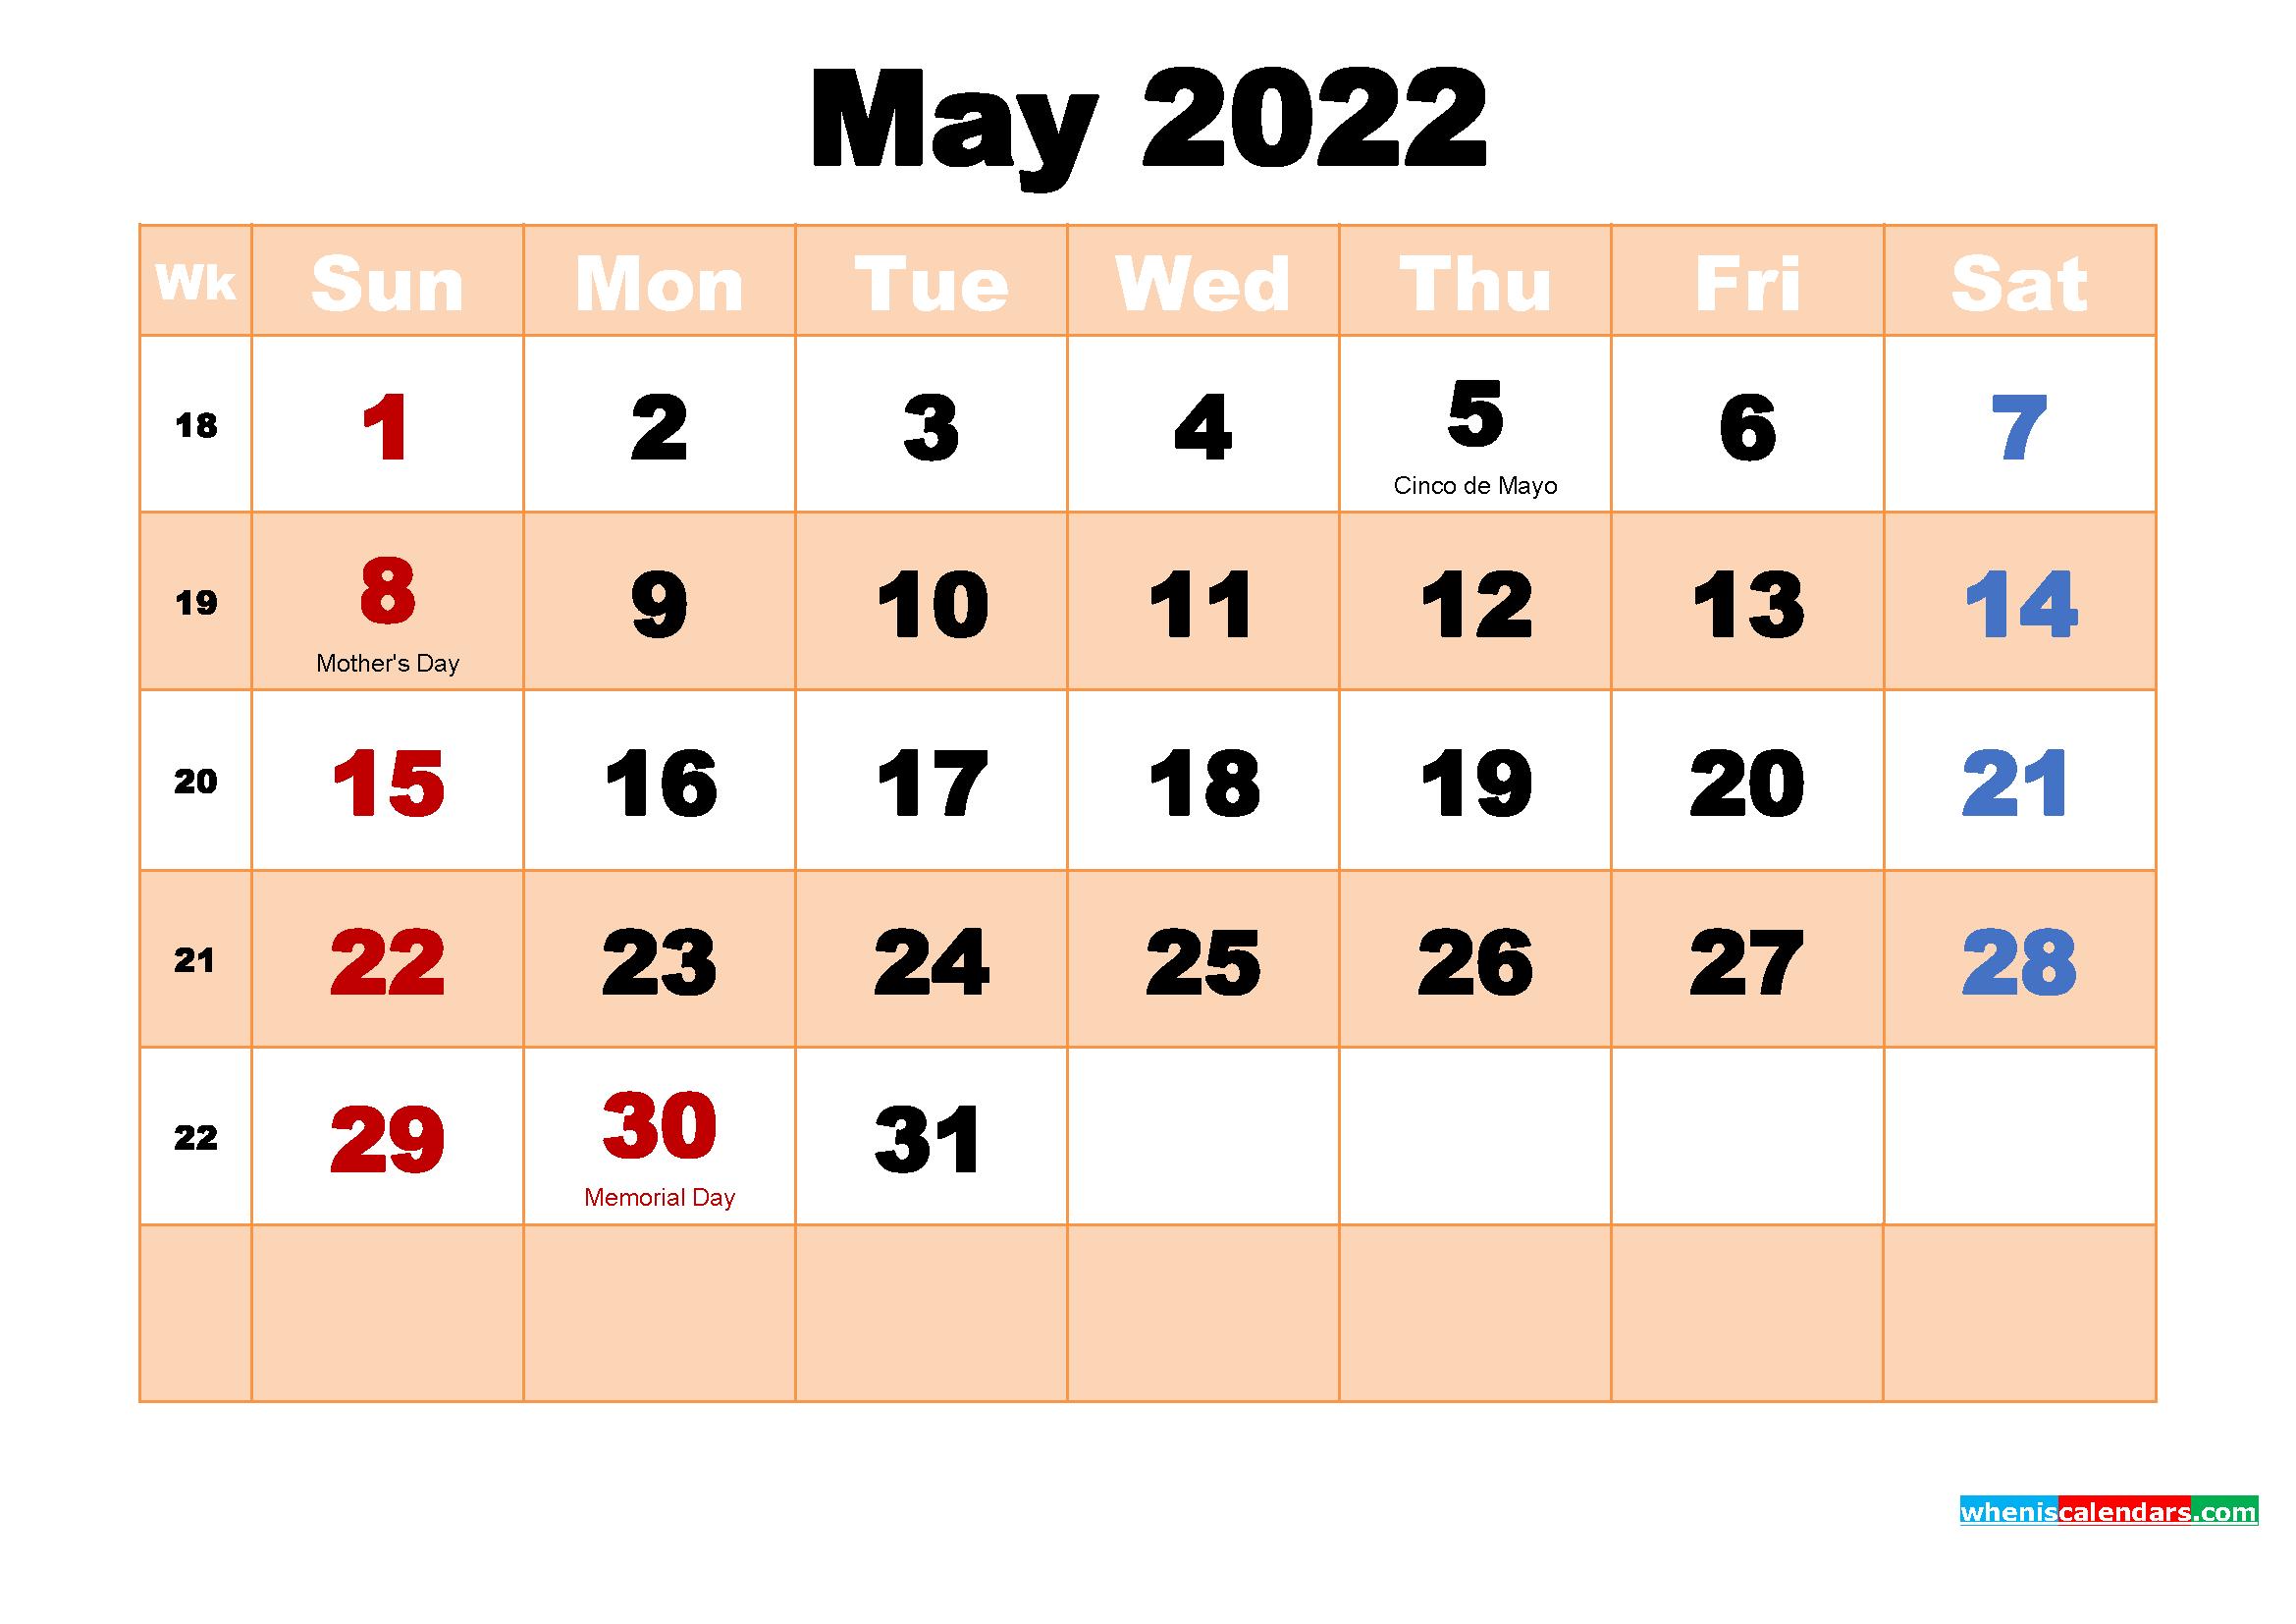 May 2022 Calendar with Holidays Wallpaper